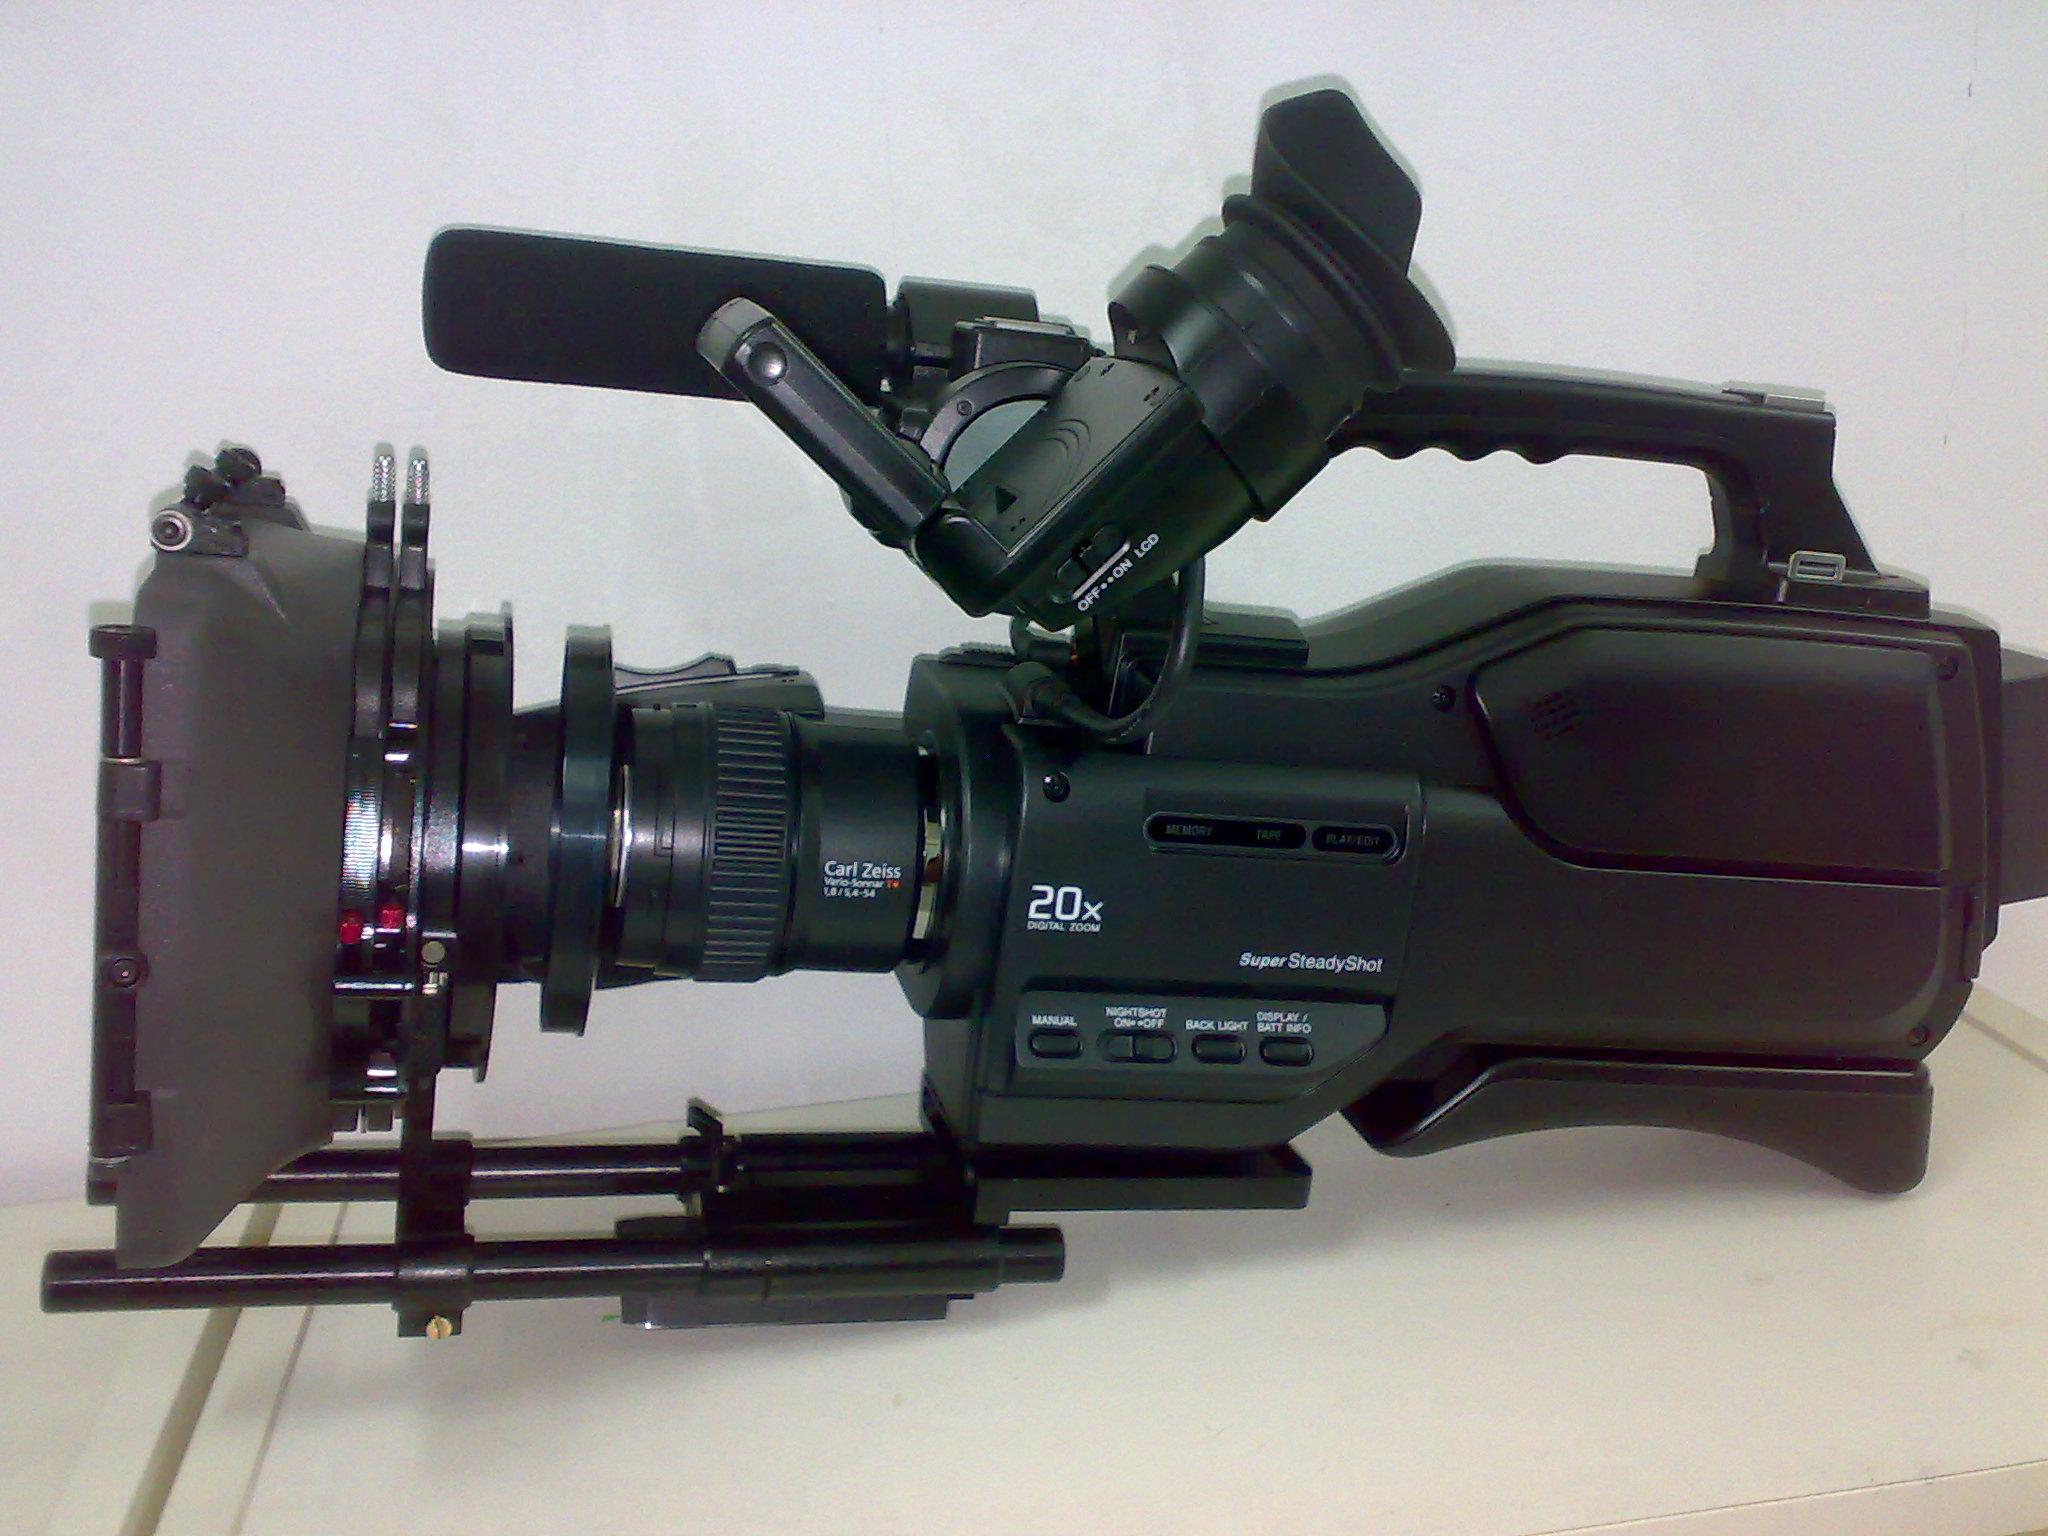 Sony HVR-HD 1000 E Profi - Camcorders - Photopoint